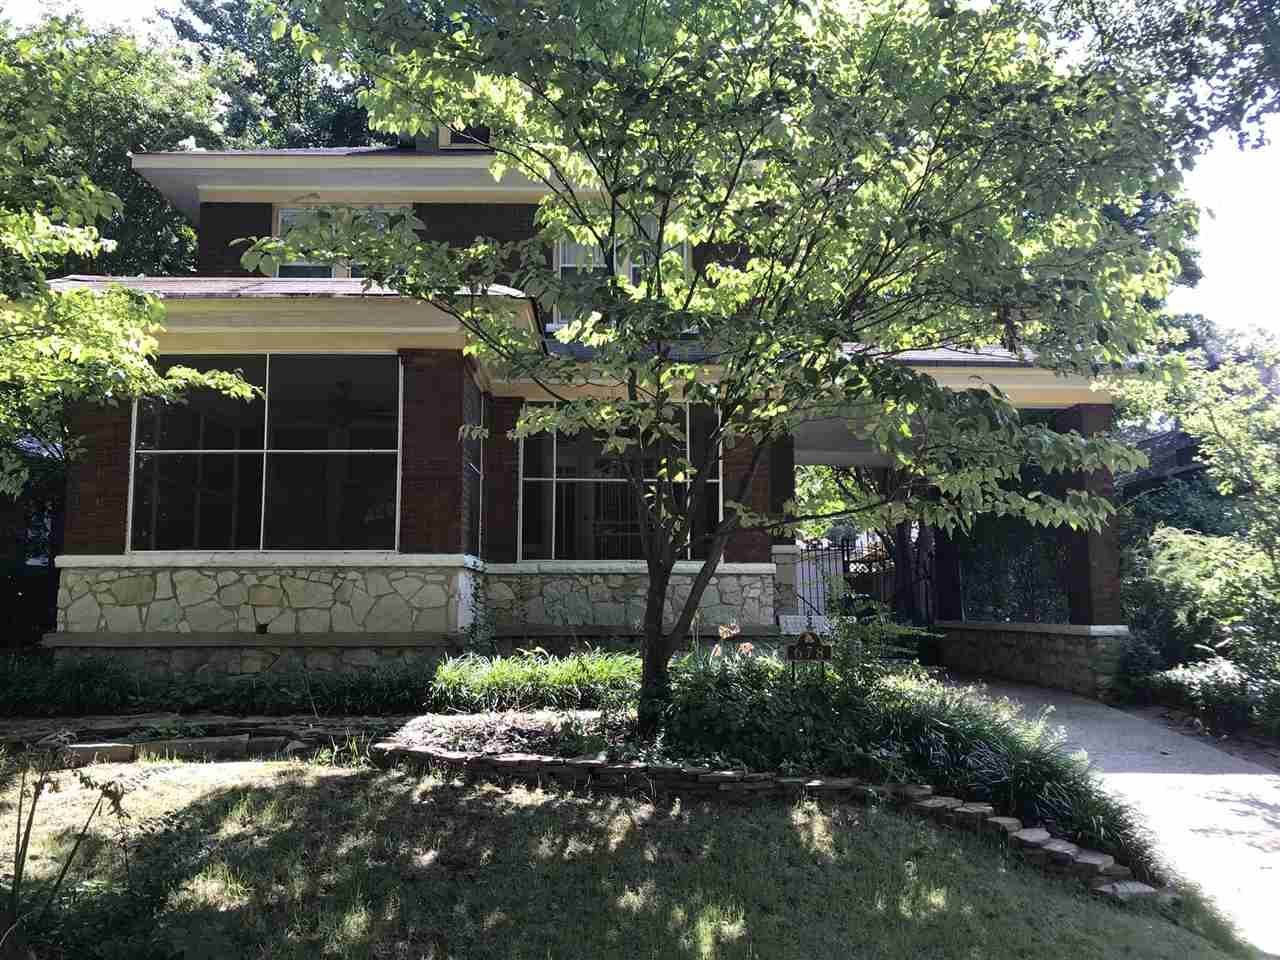 678 N Idlewild, Memphis, TN 38107